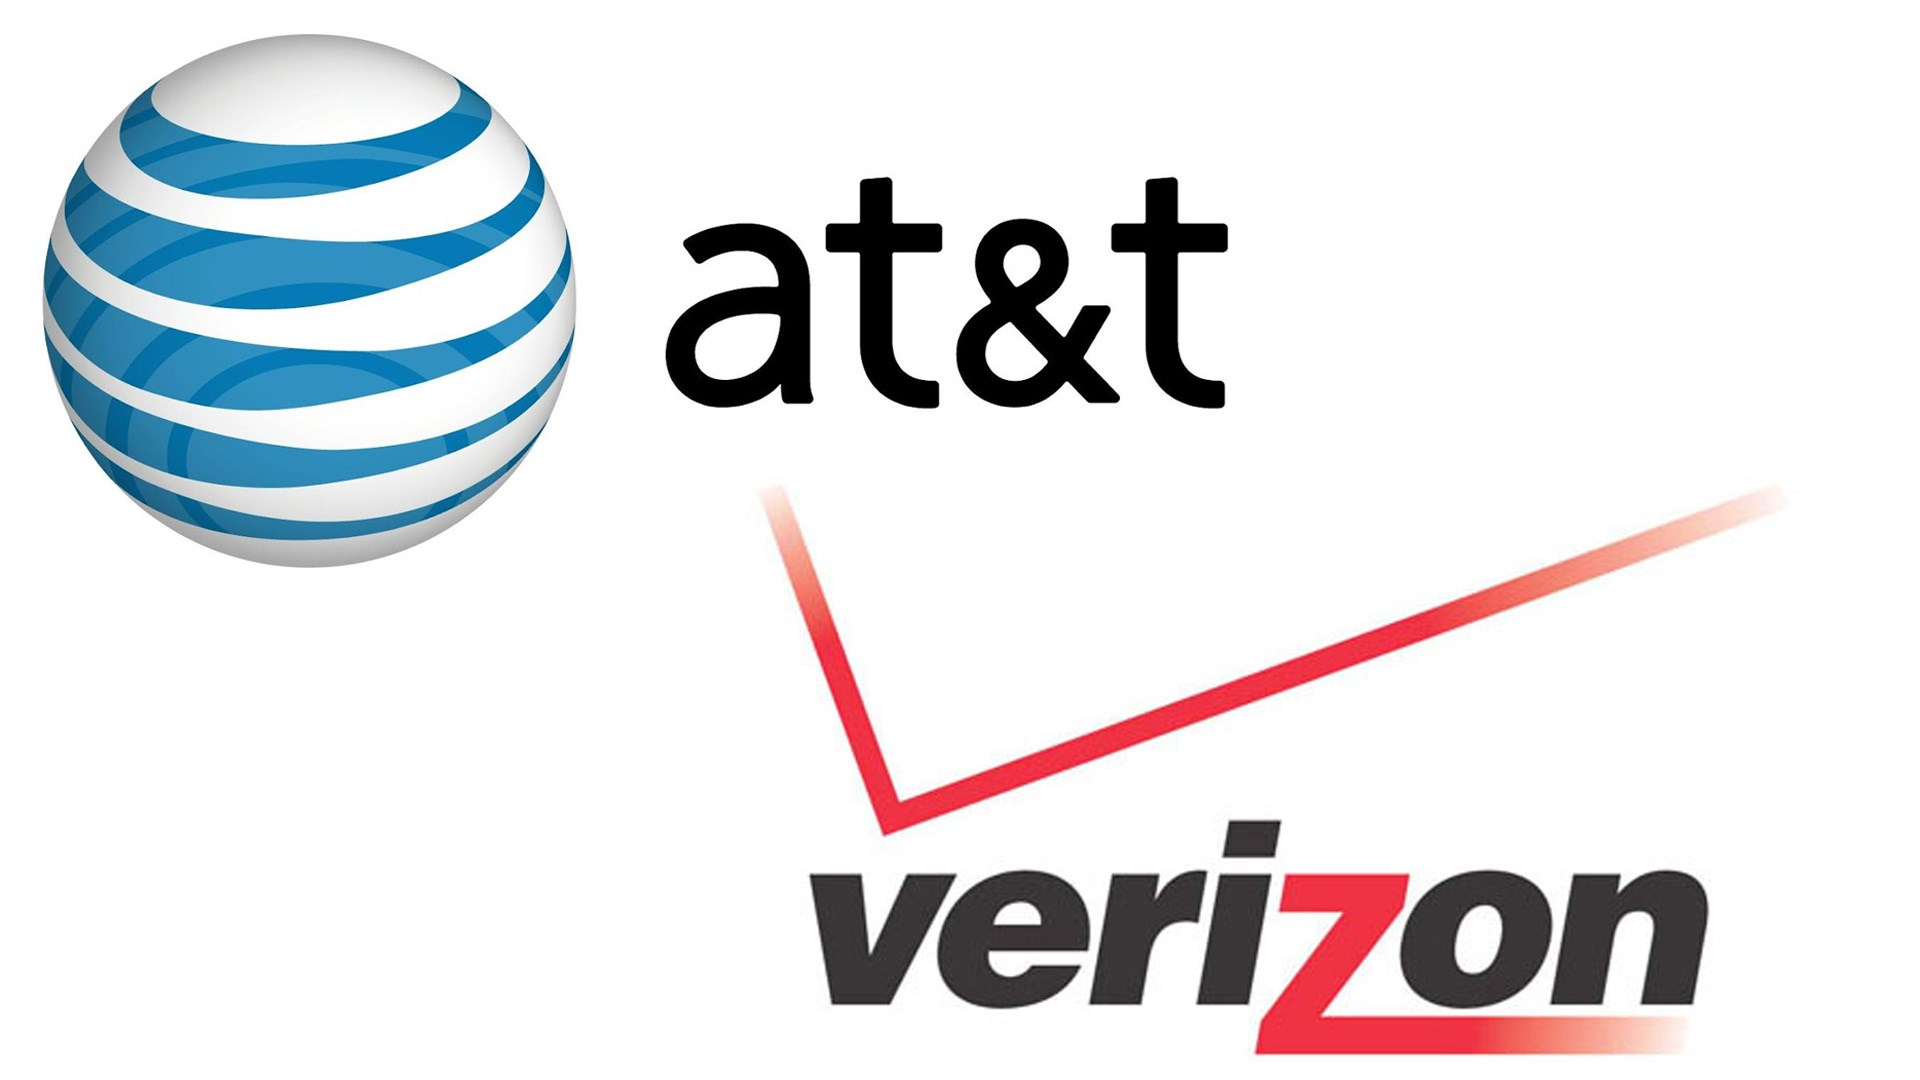 ATT and Verizon logos